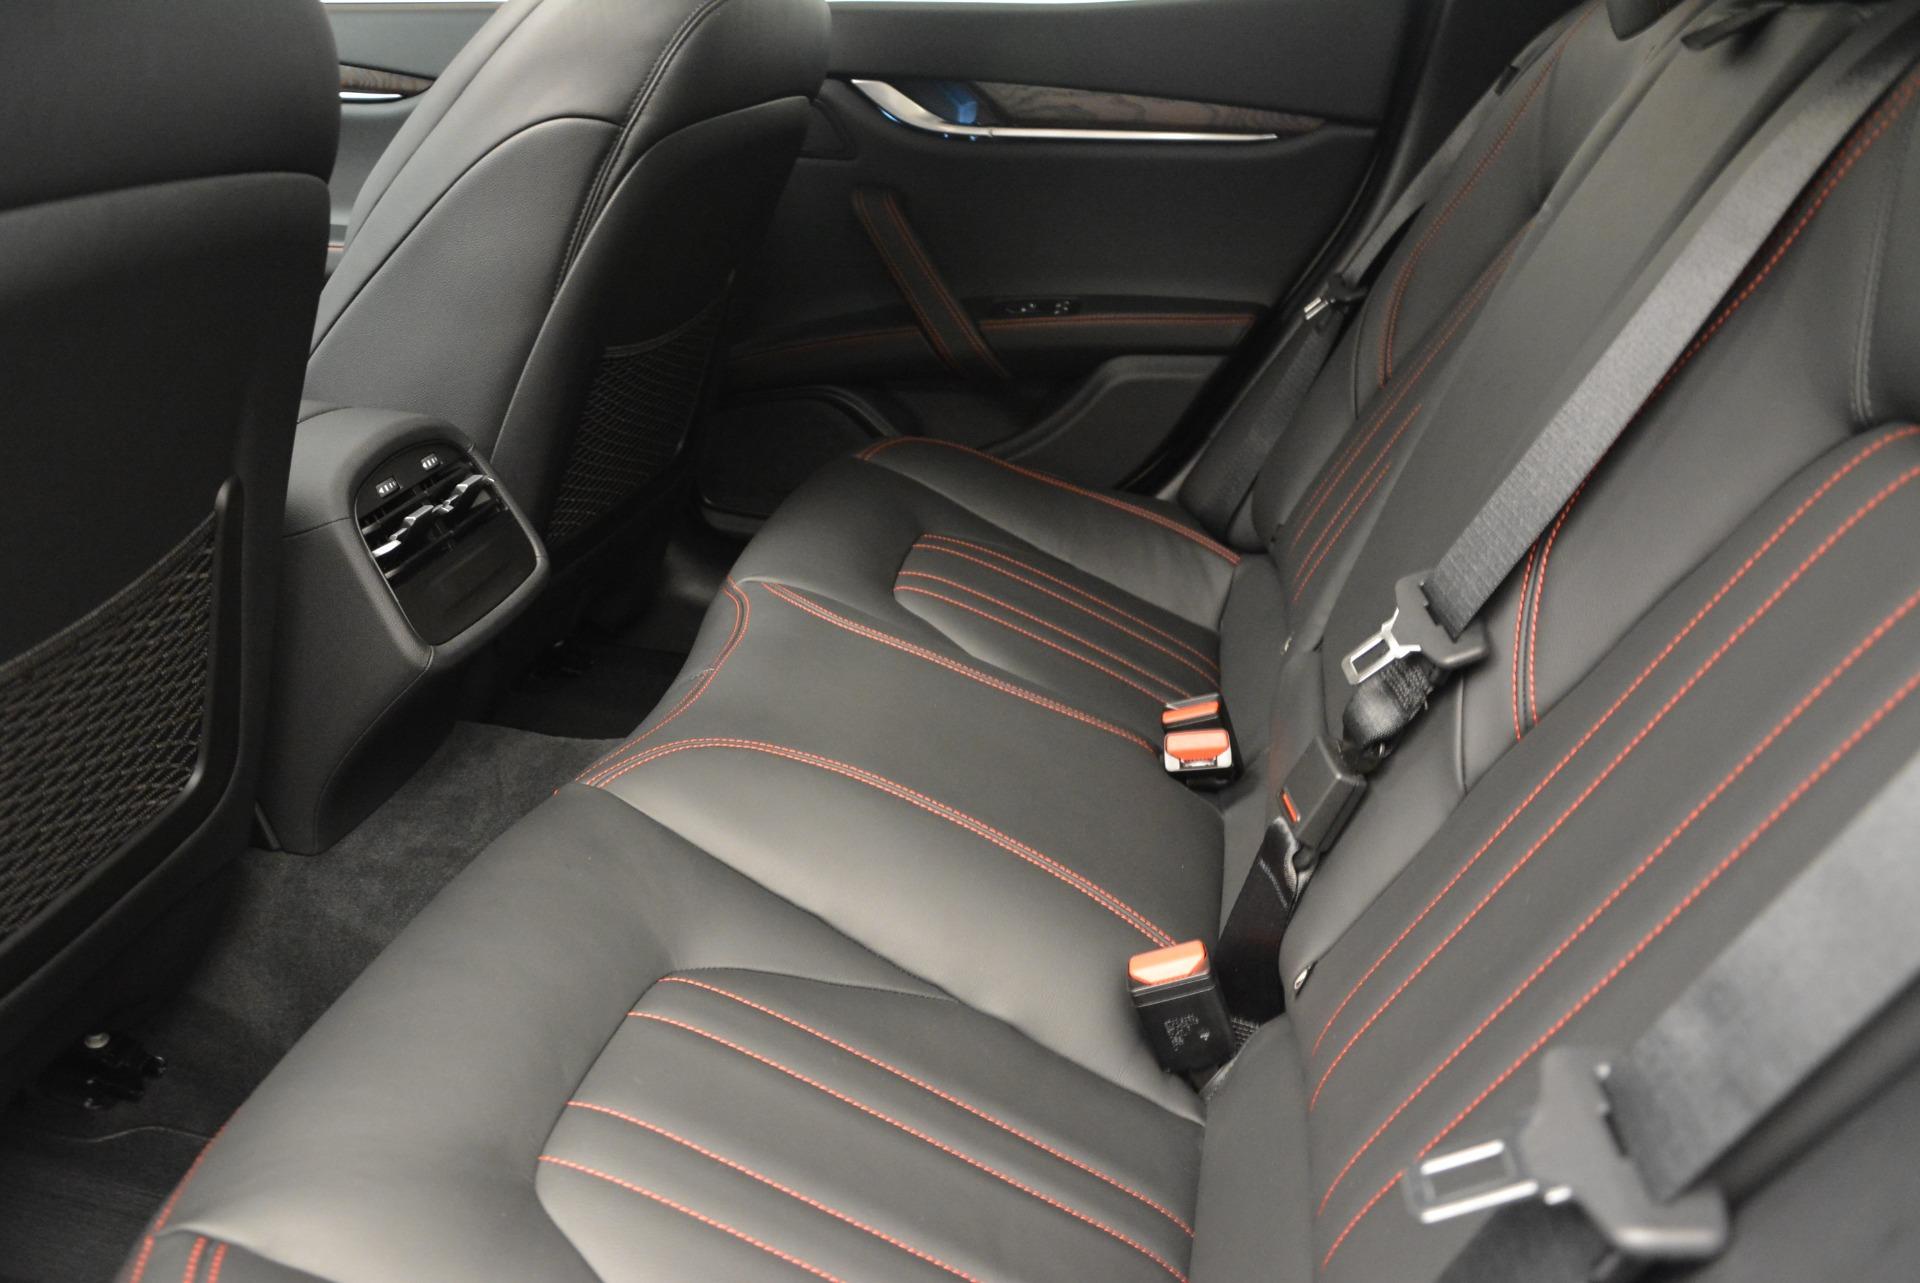 Used 2015 Maserati Ghibli S Q4 For Sale In Westport, CT 2070_p16